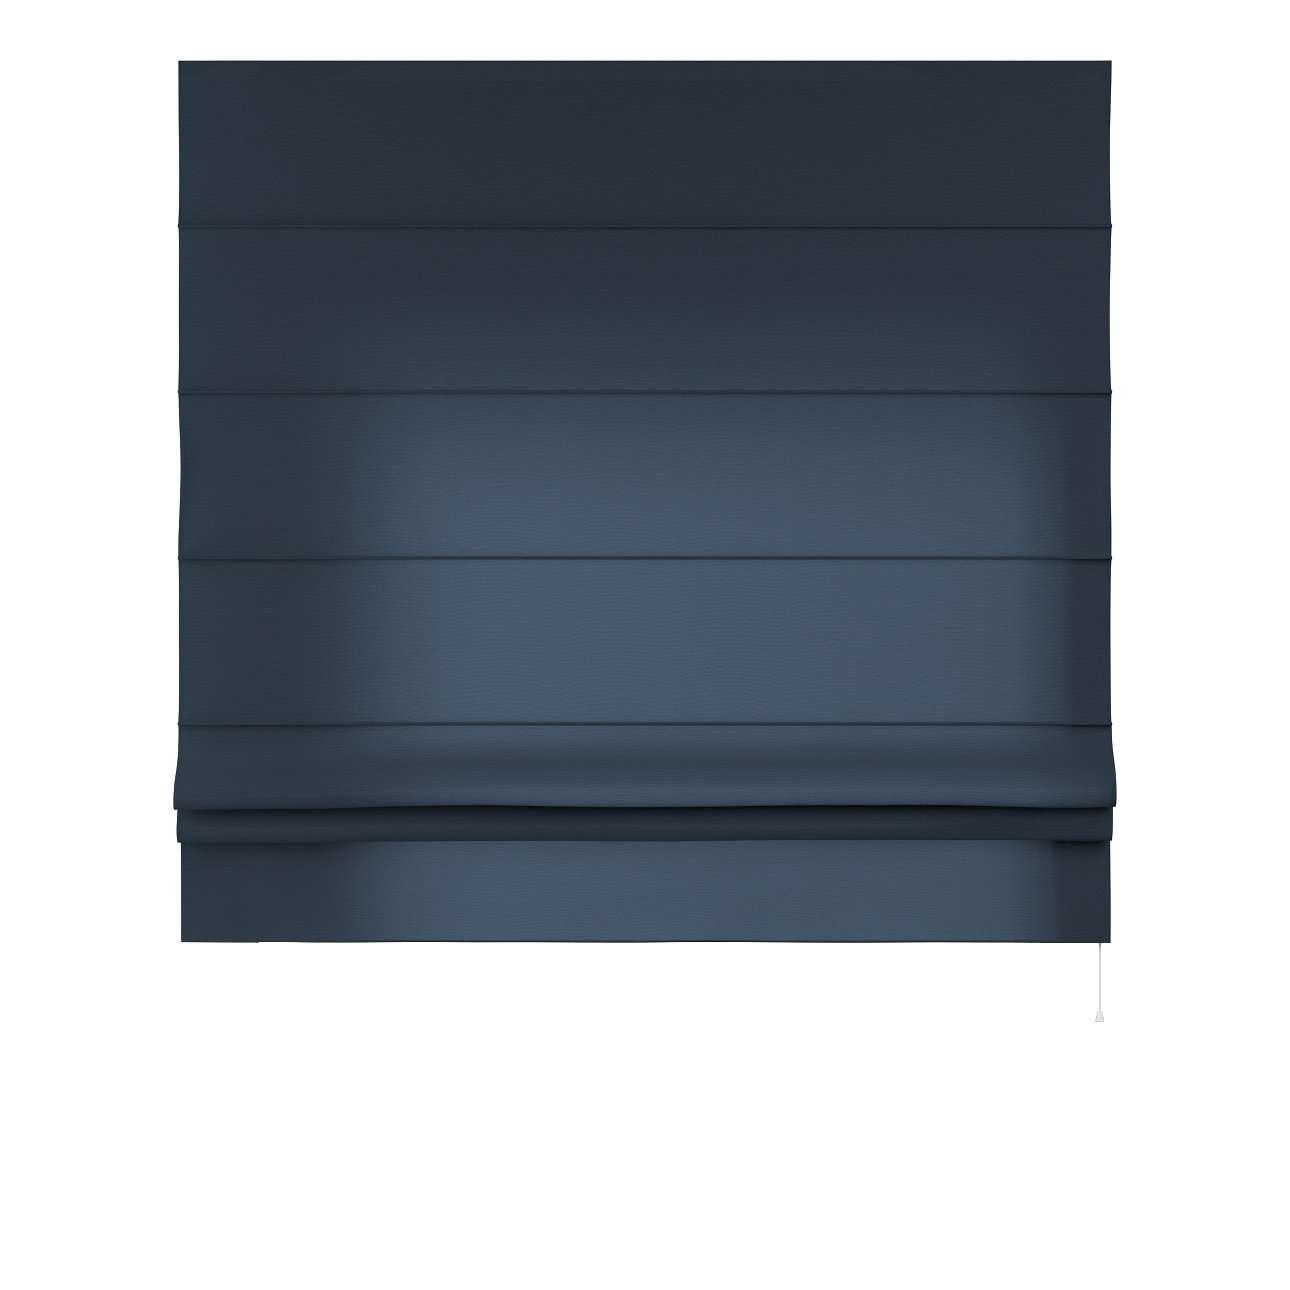 Raffrollo Padva 80 x 170 cm von der Kollektion Quadro, Stoff: 136-04